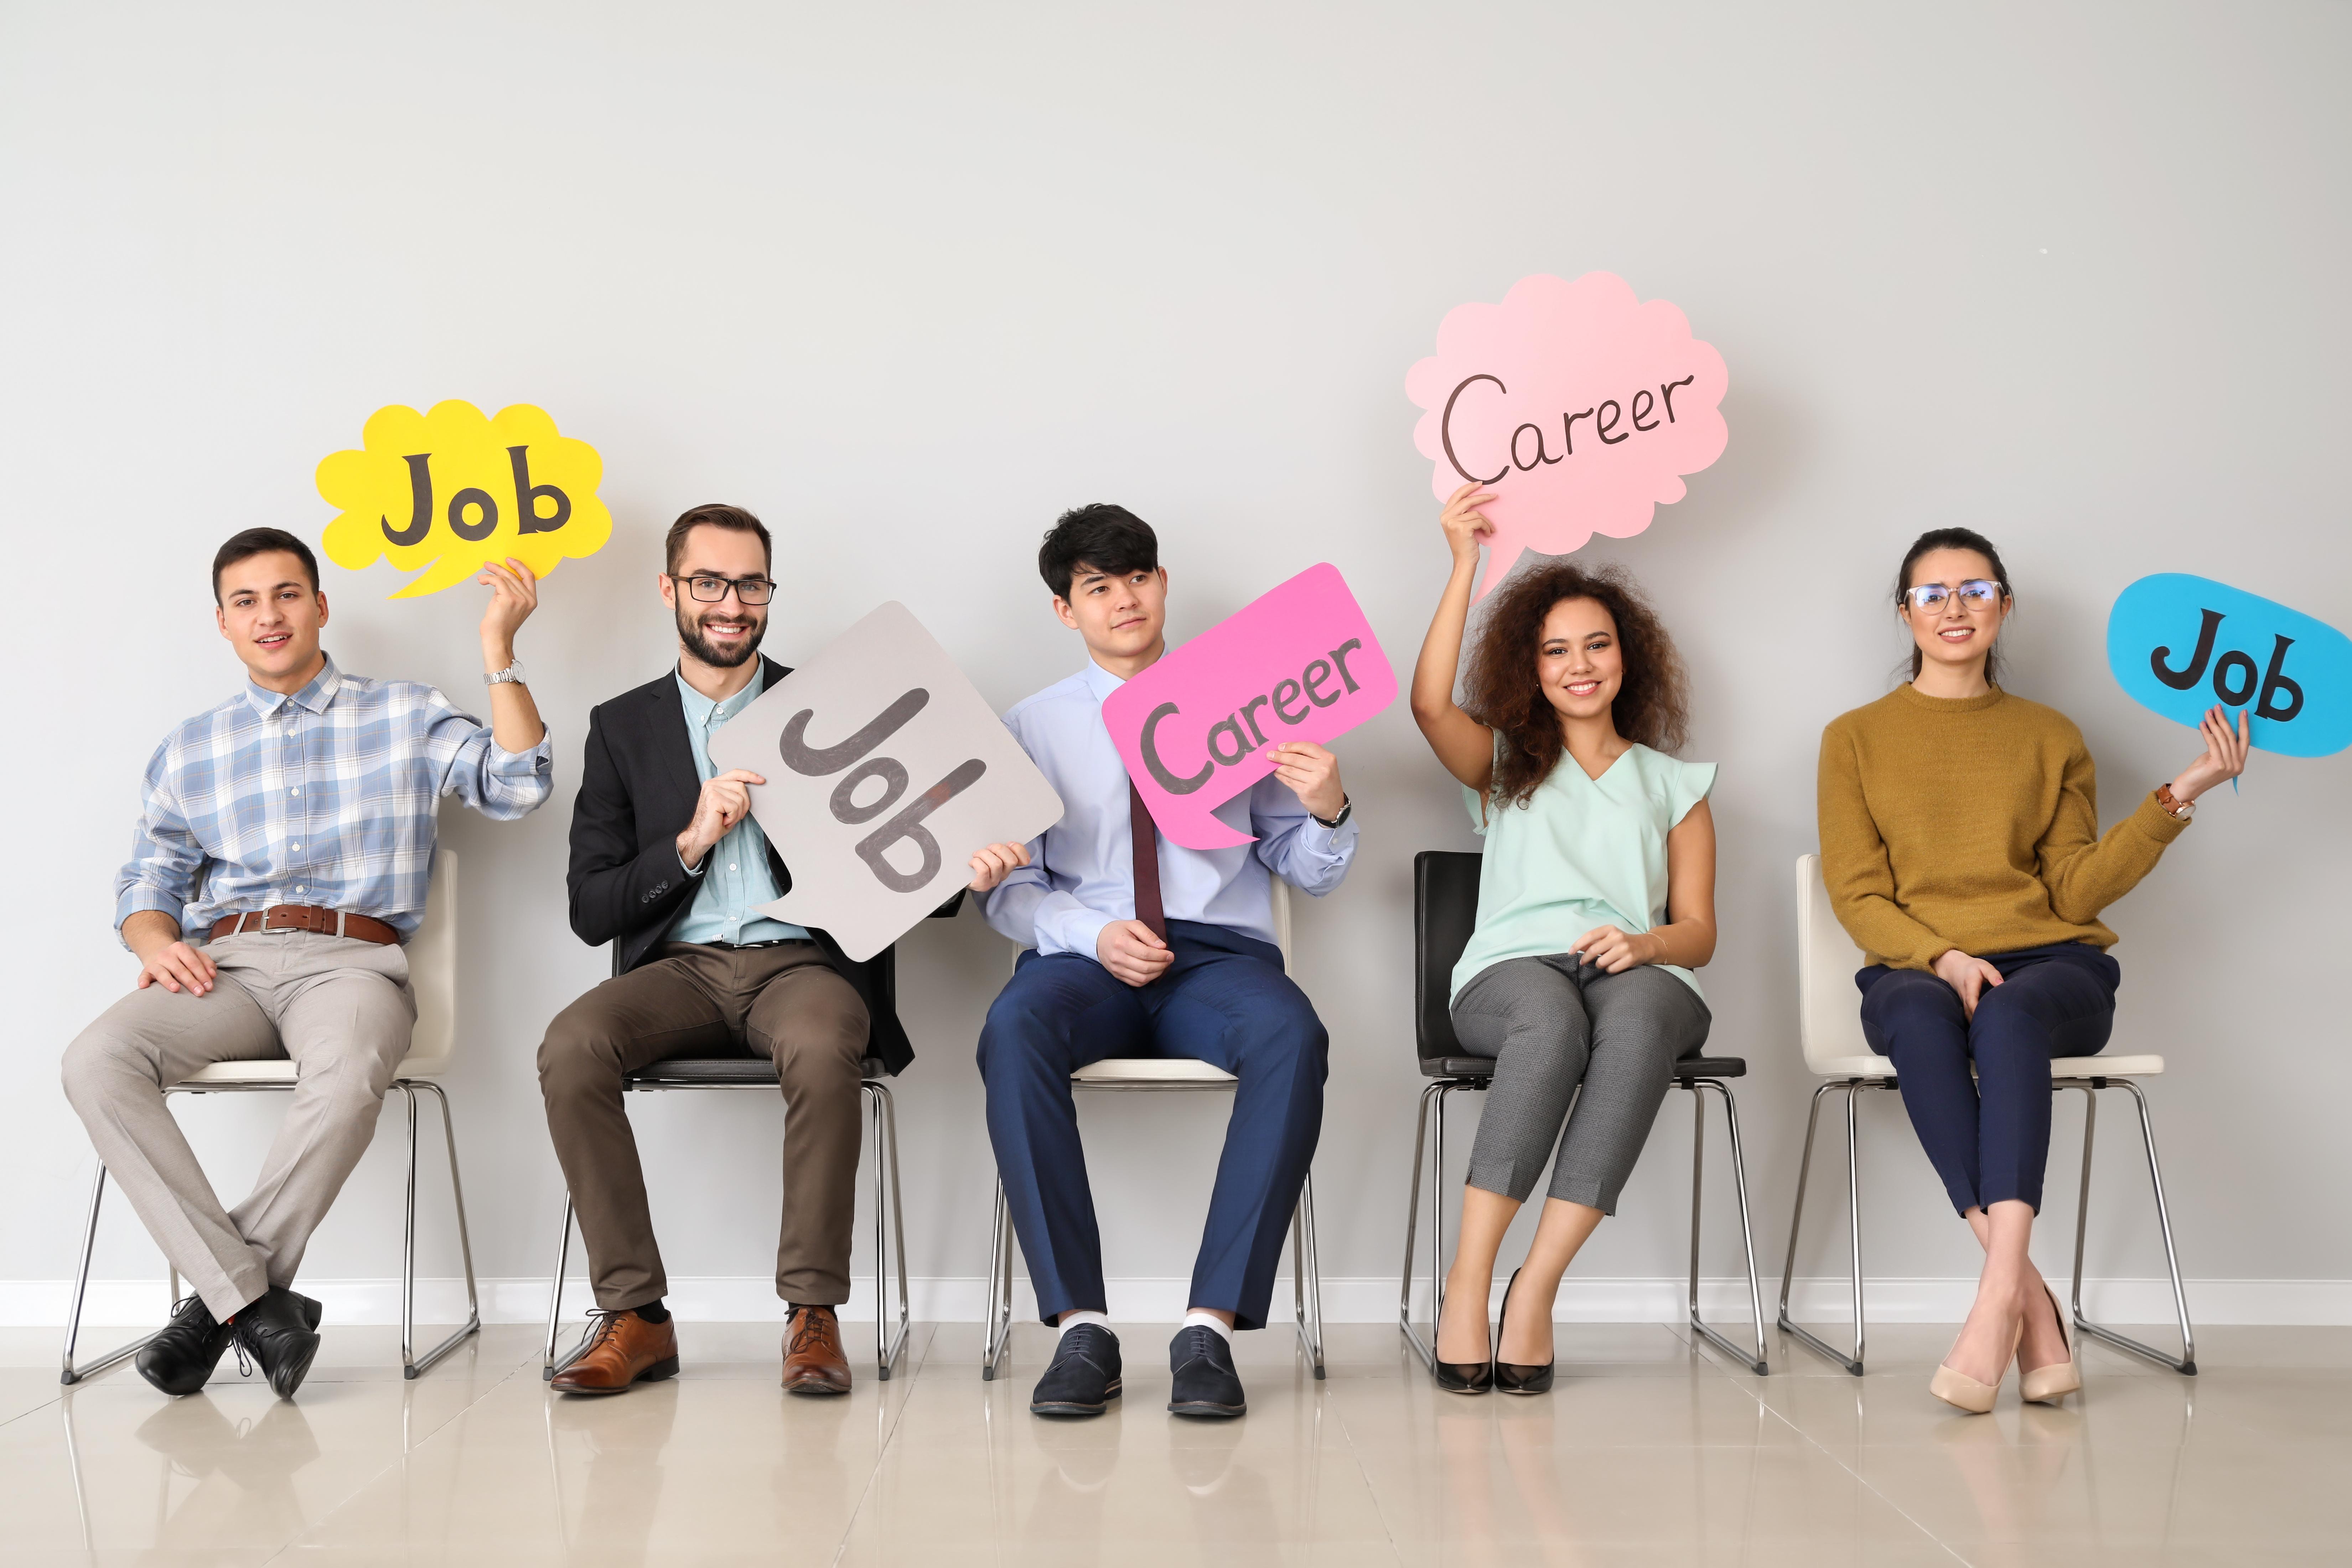 career vs a job